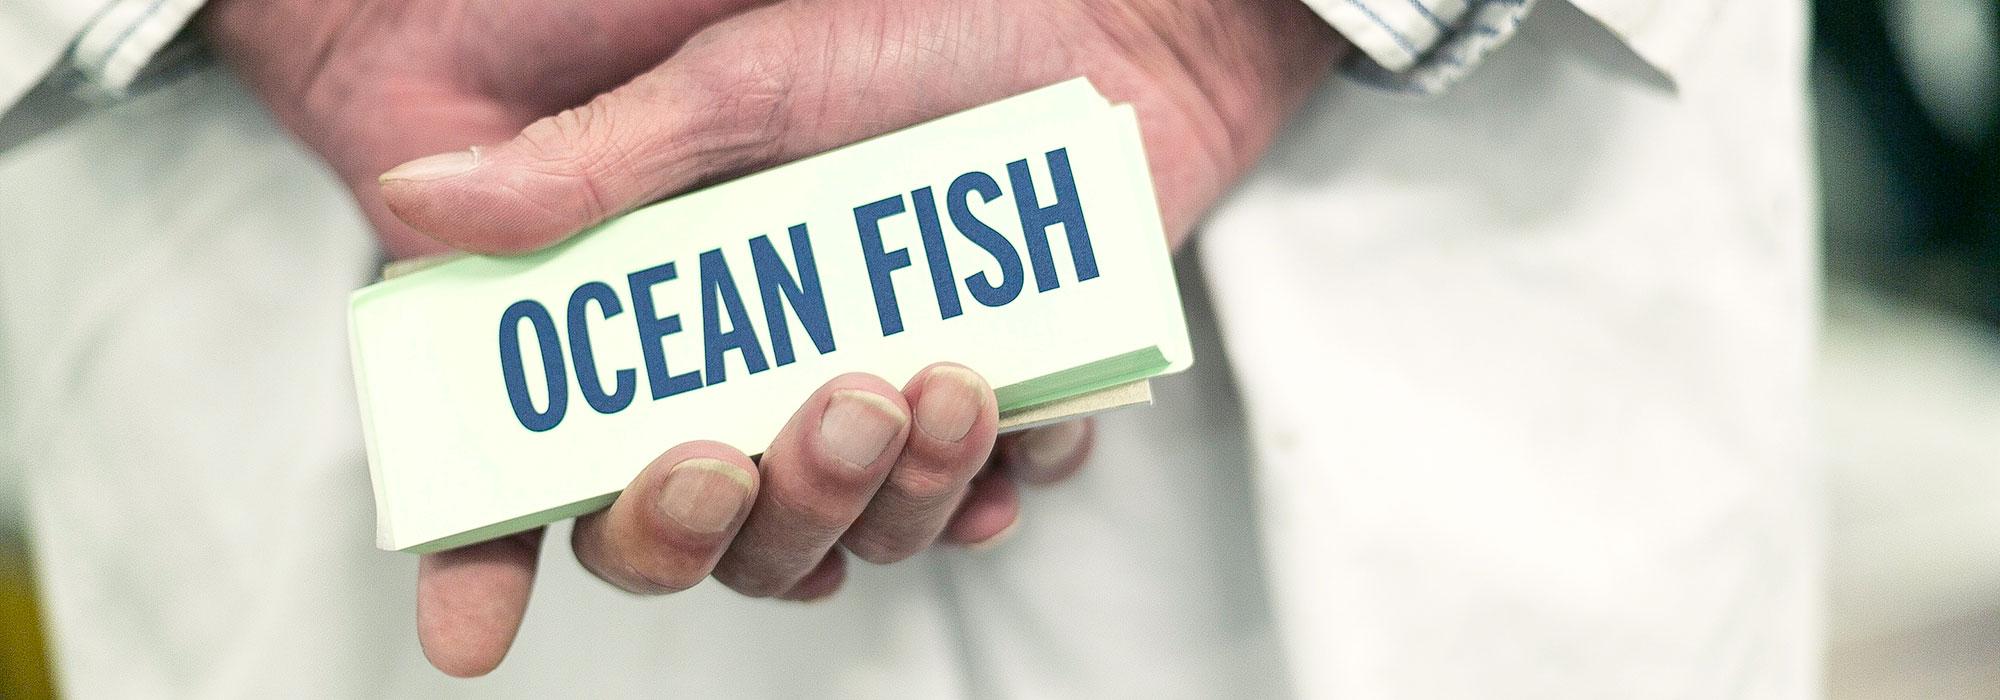 fish-buyers-hands-at-brixham-fish-market - Ocean Fish